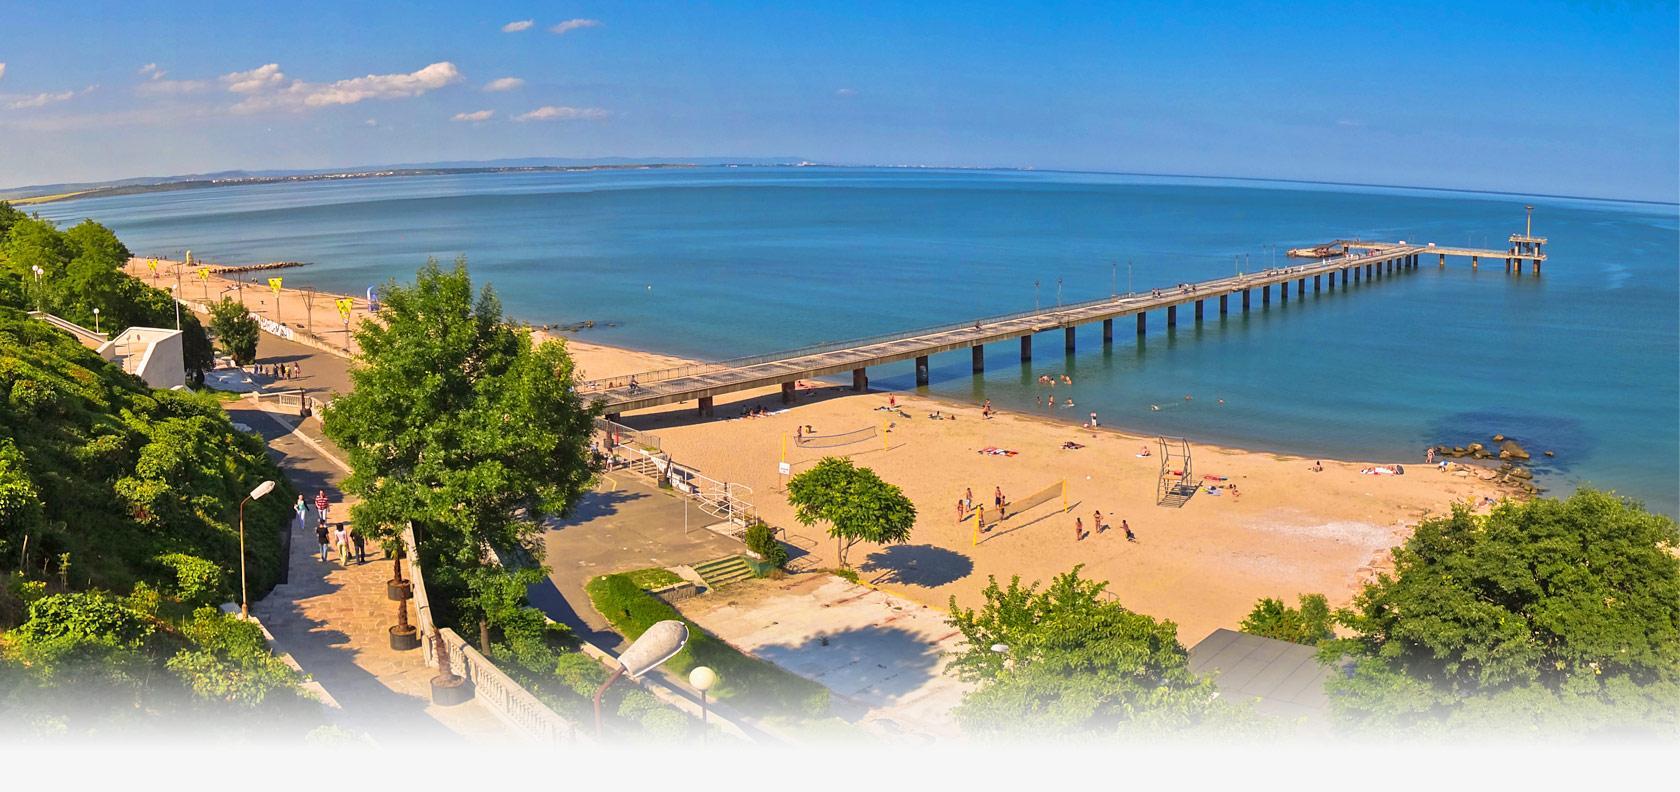 Бургас се включва в проект за устойчив културен туризъм